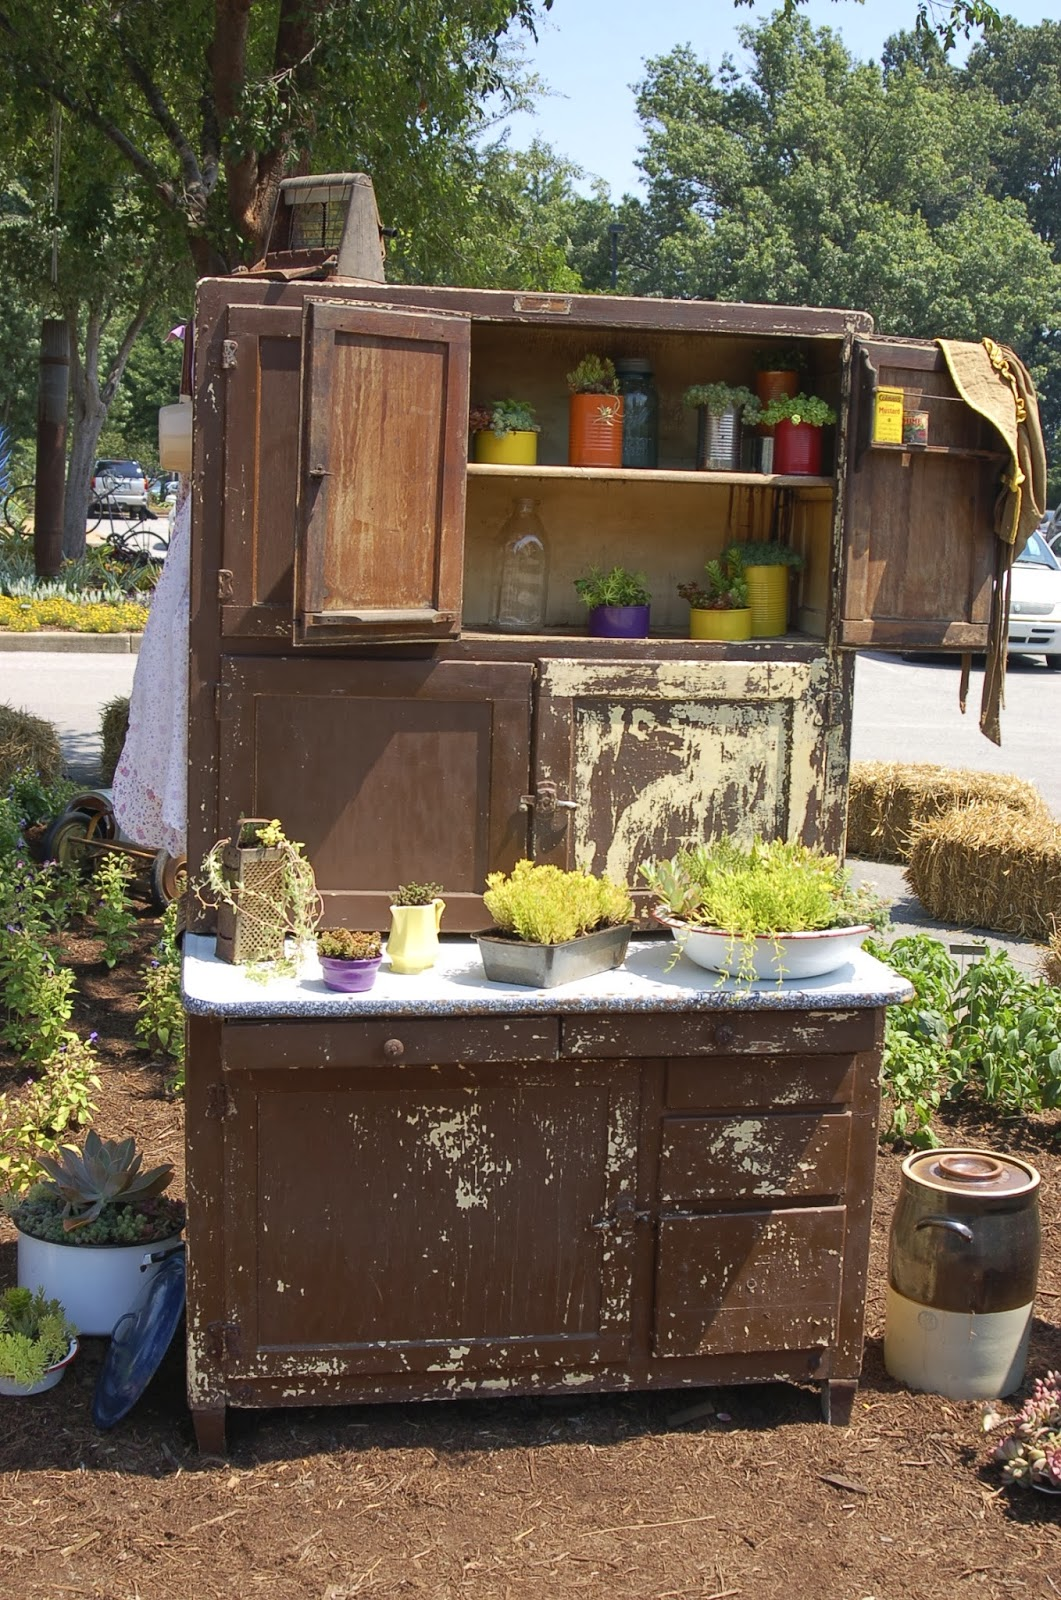 bwisegardening: Around The Garden World - Day 51 (Jackson, TN - UT ...